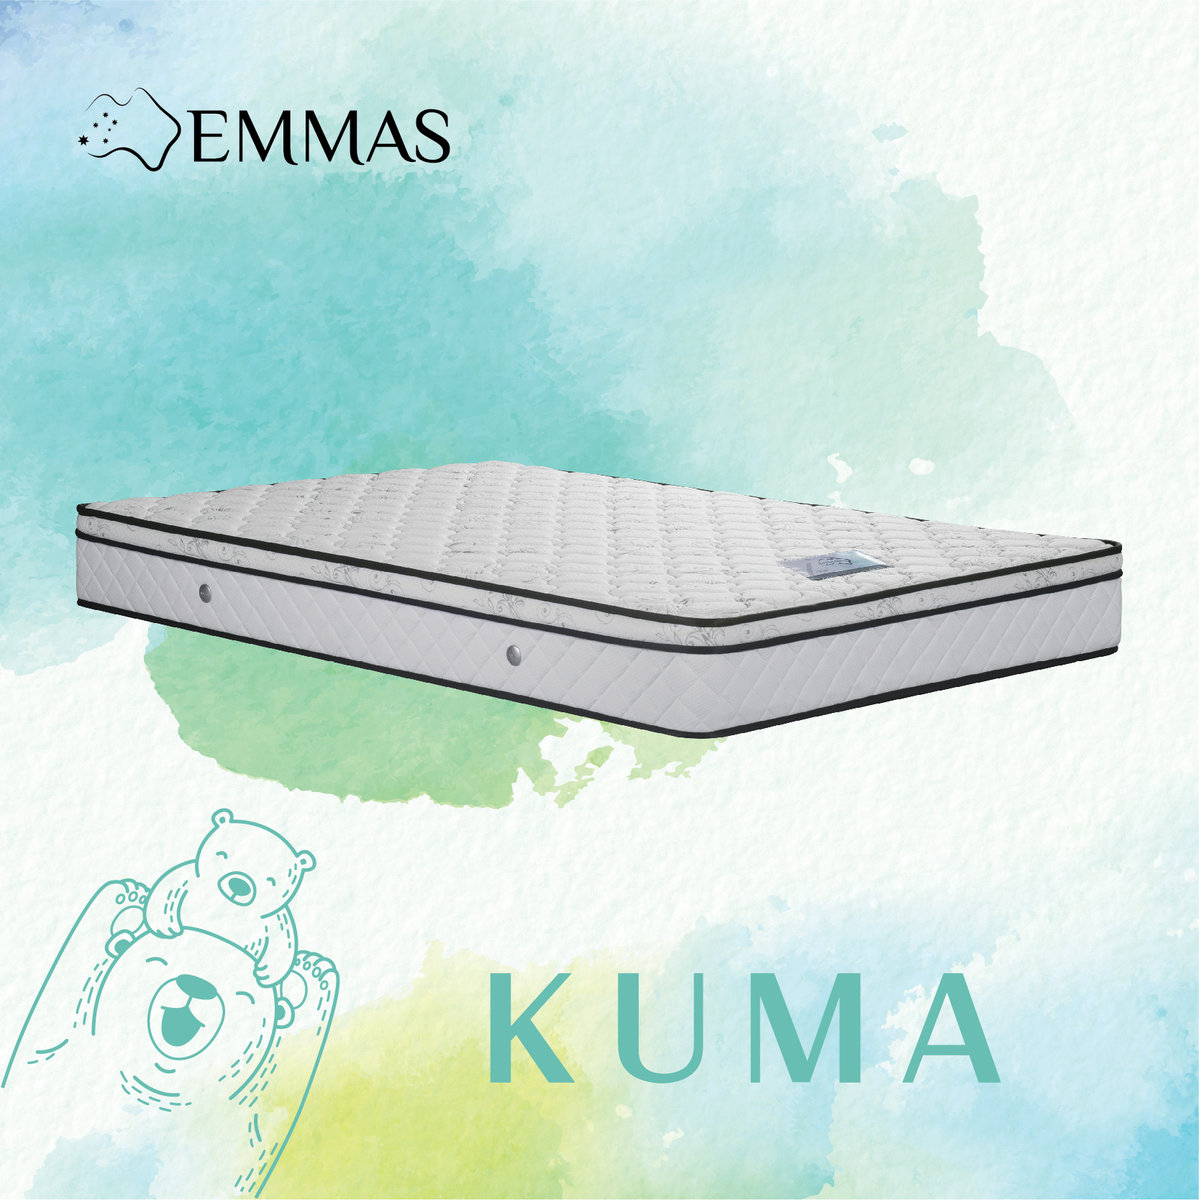 EMMAS | EMMAS KUMA Mattress 42x75x8 | Size : 42x75 | HKTVmall Online